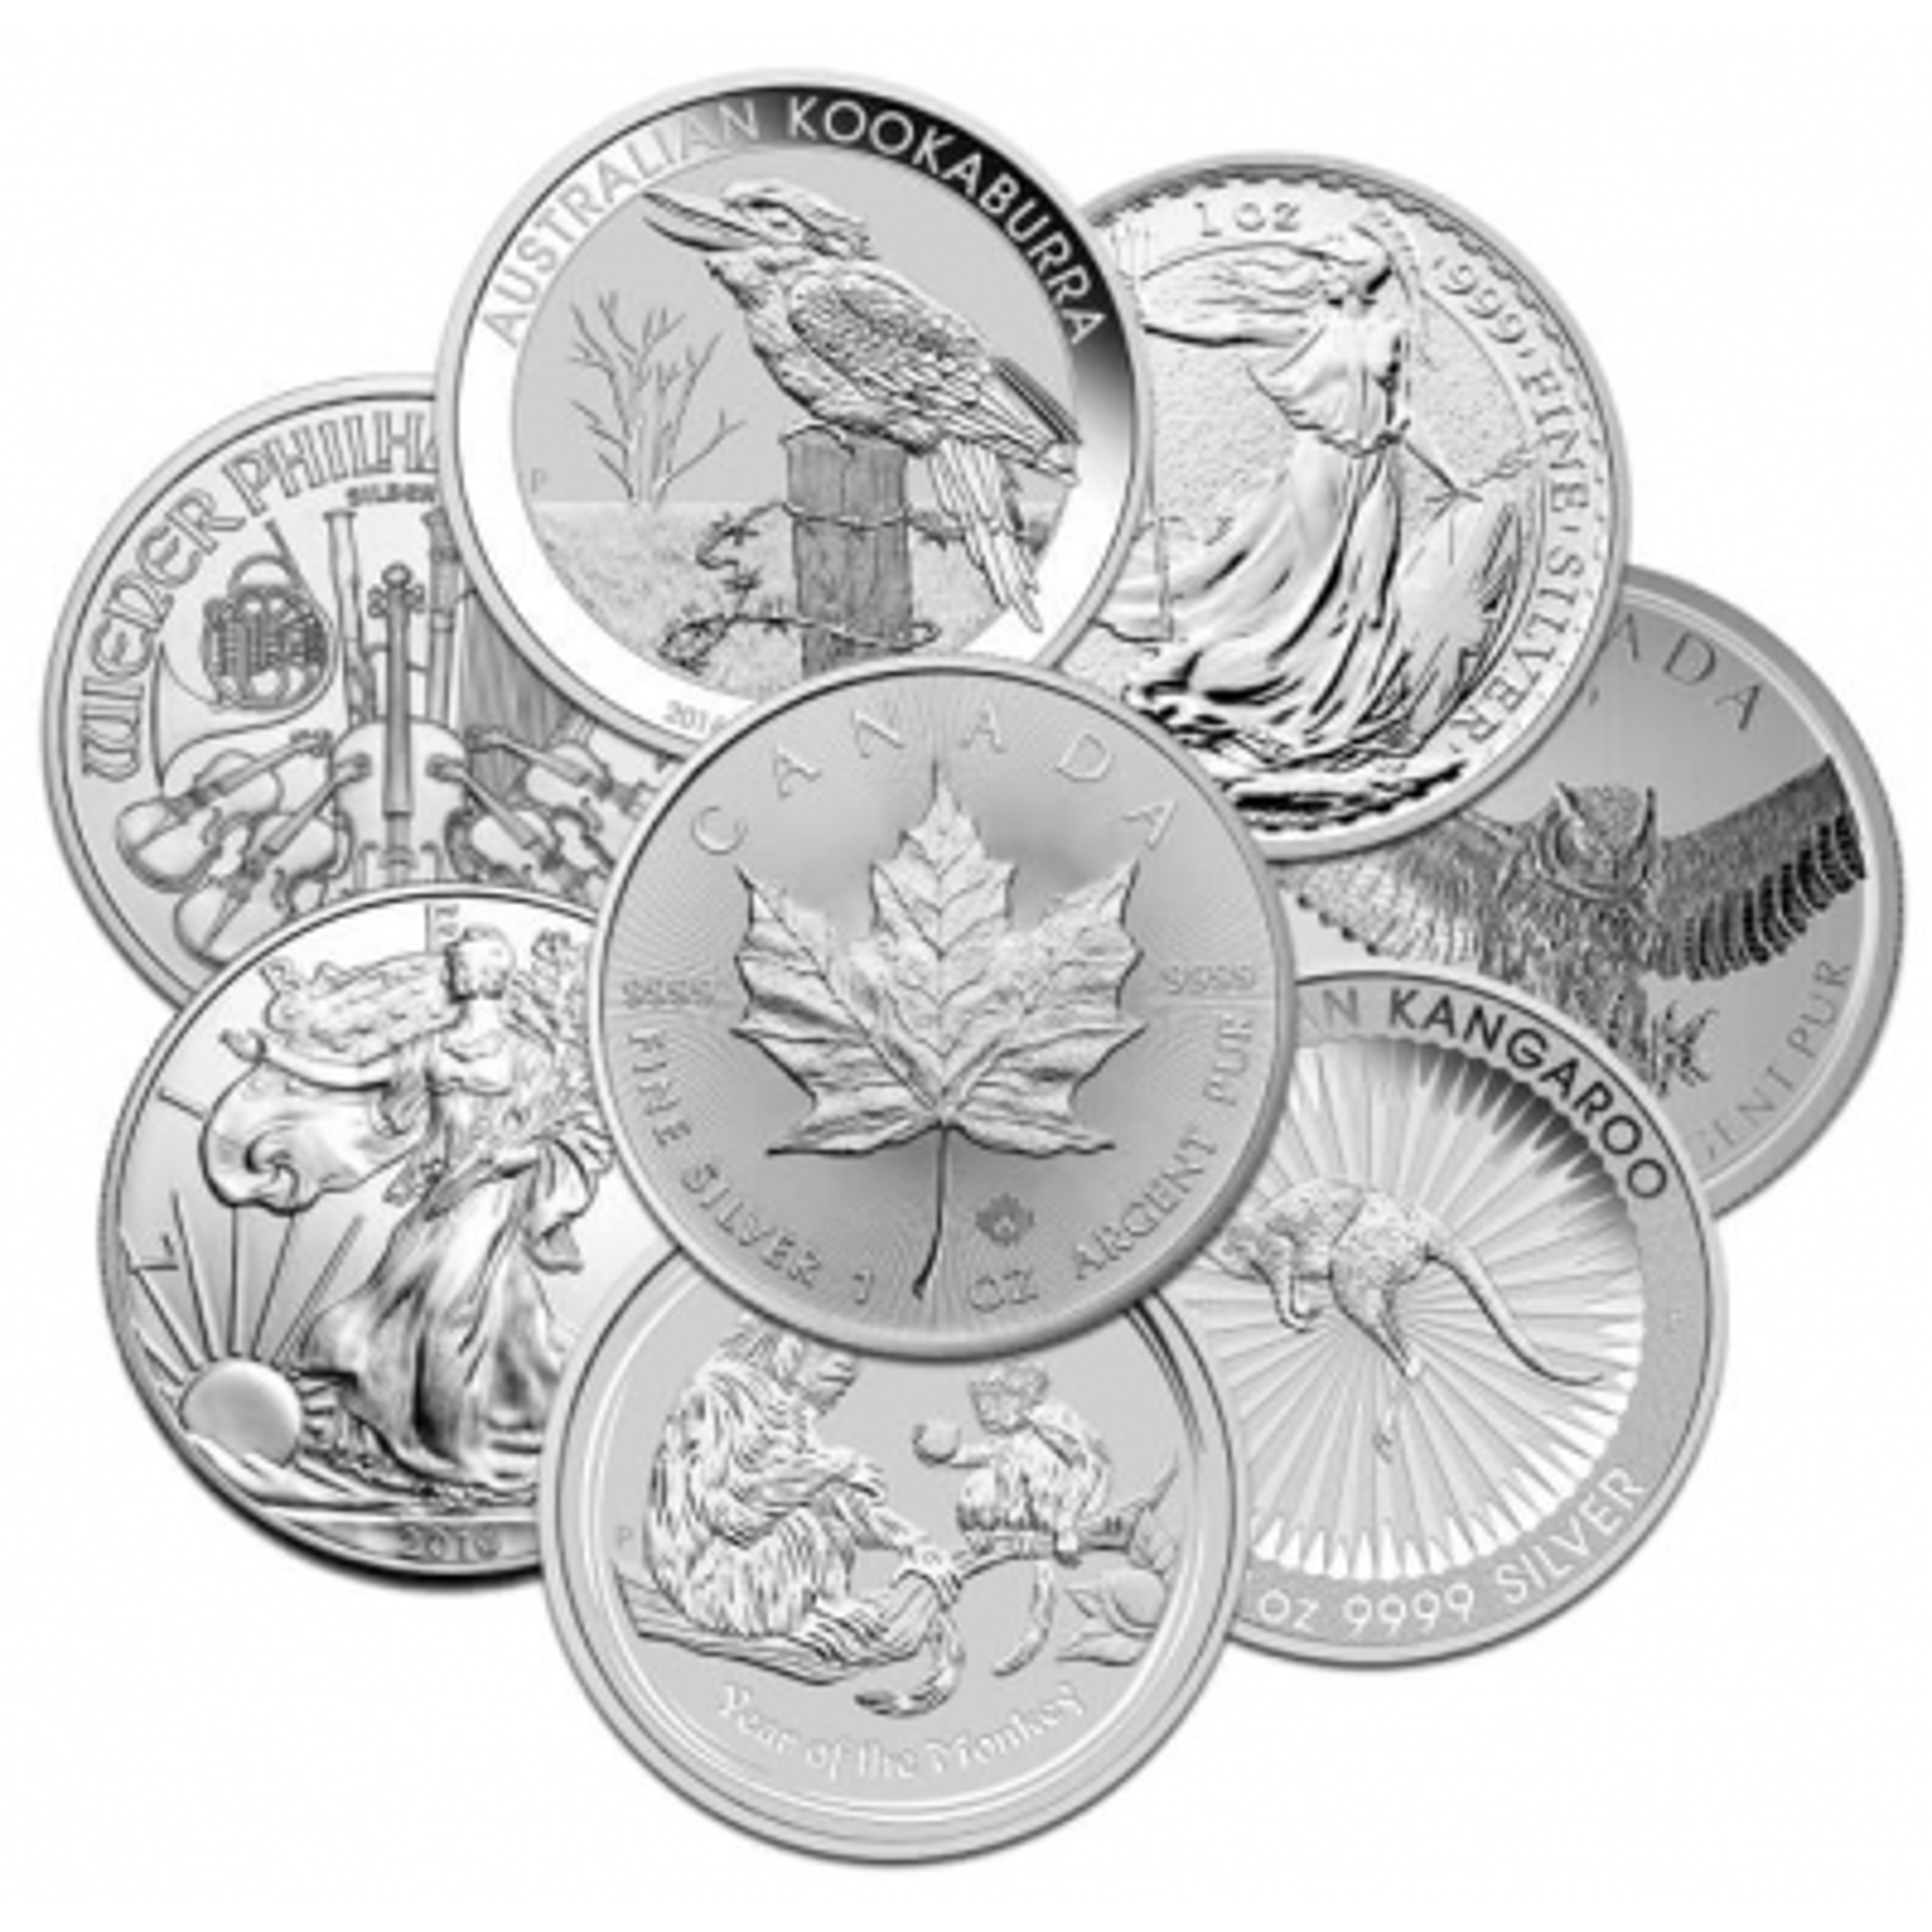 25 Troy ounce various circulated silver collector coins